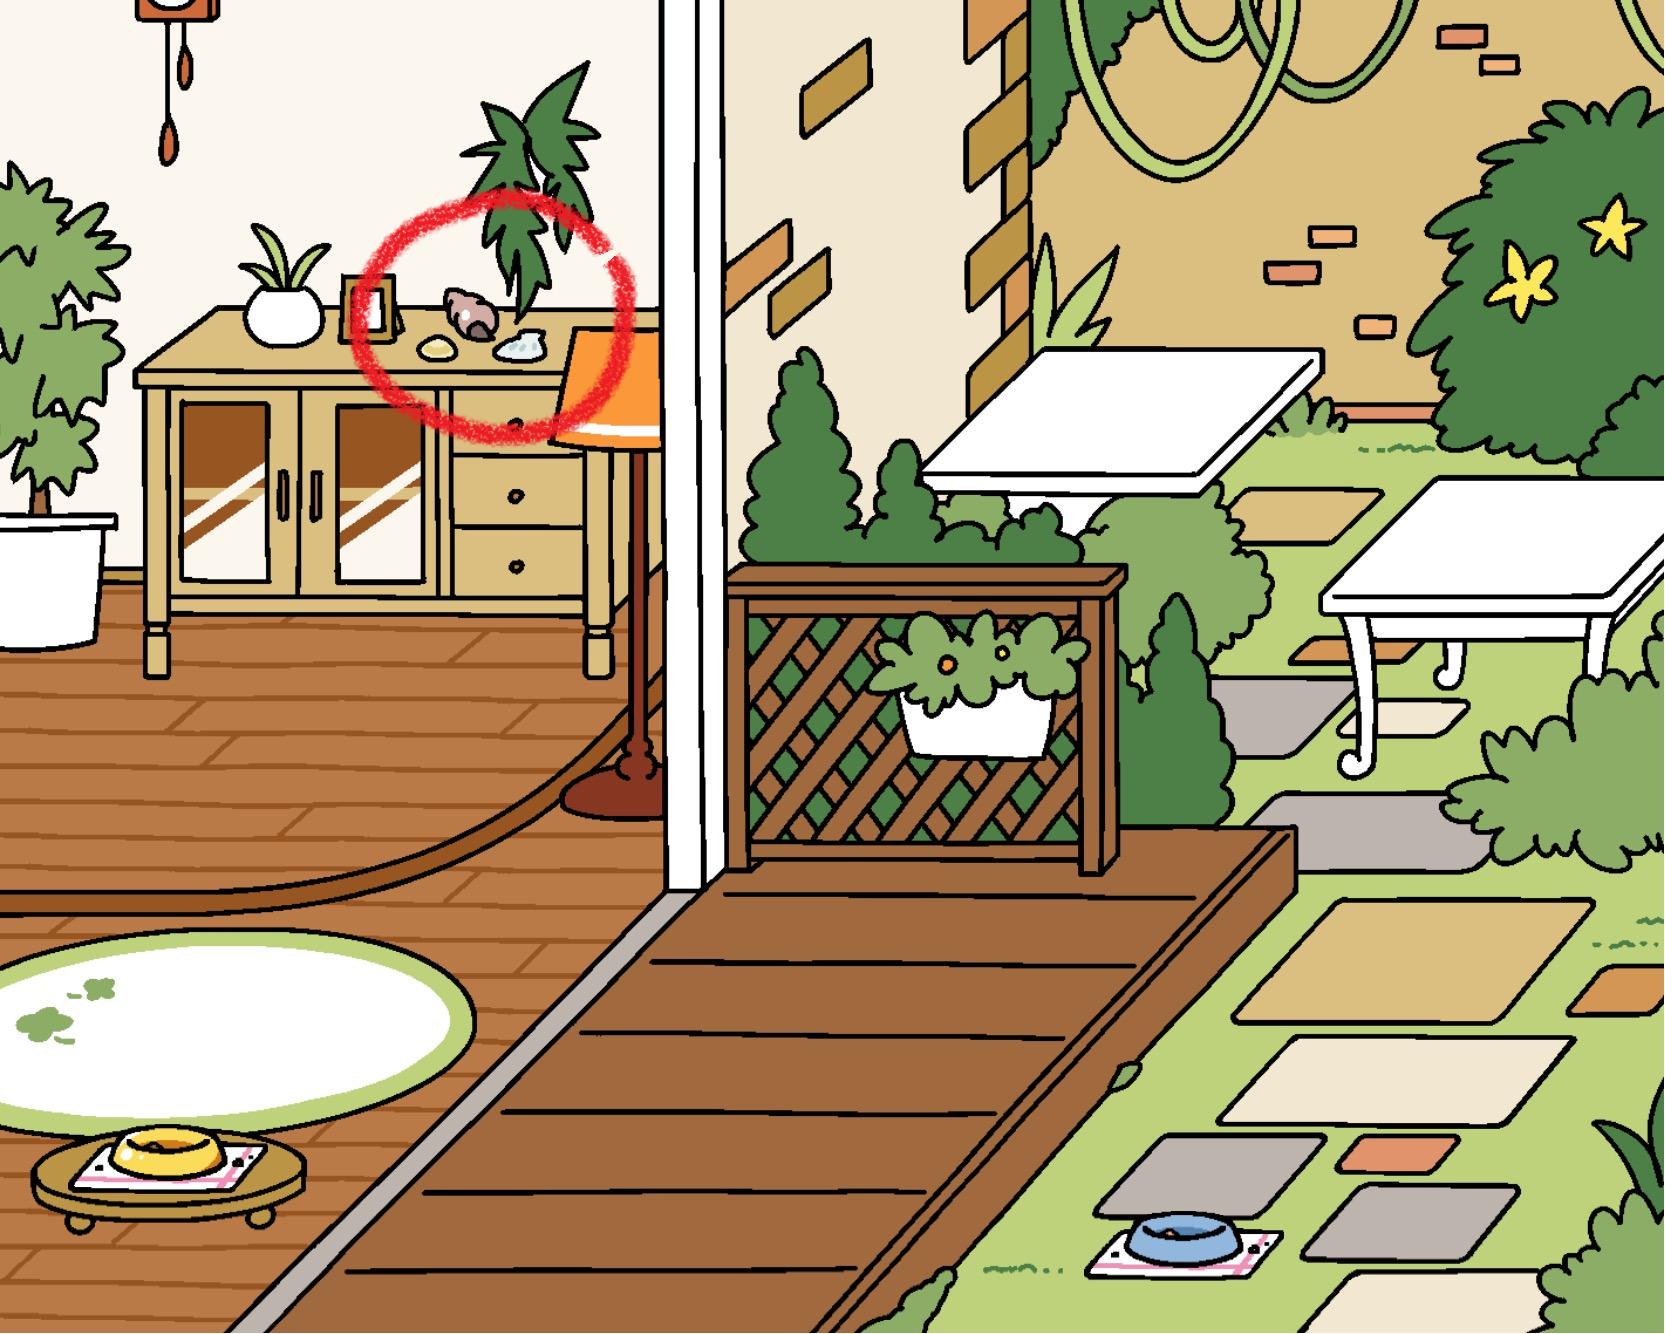 neko atsume update rustic style yard